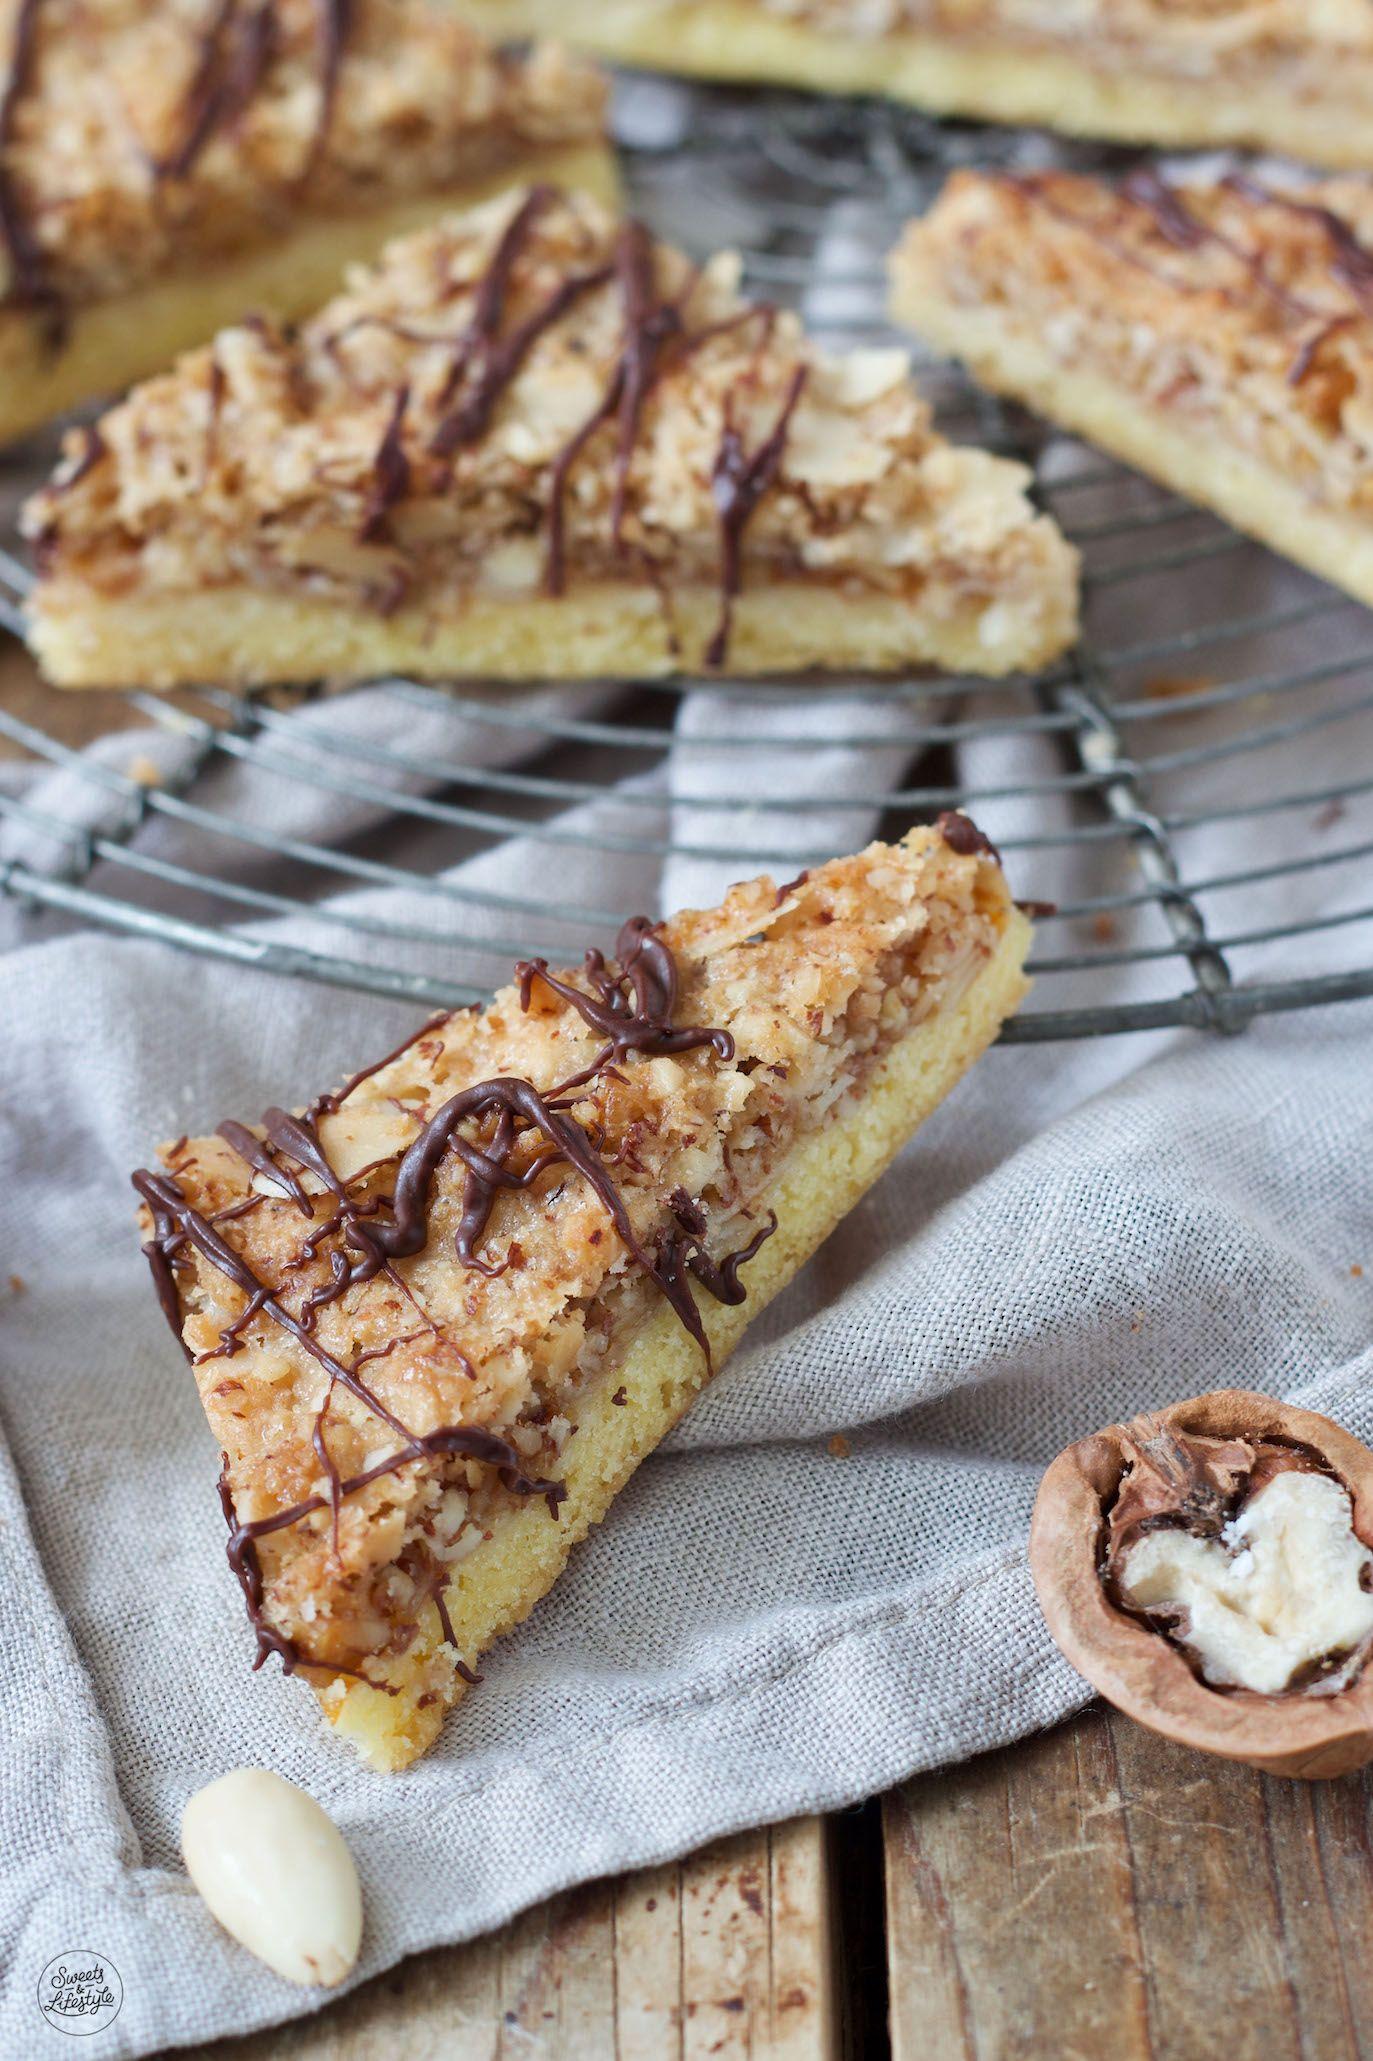 Saftige Nussecken vom Blech - Rezept - Sweets & Lifestyle®️ #nusseckenrezept